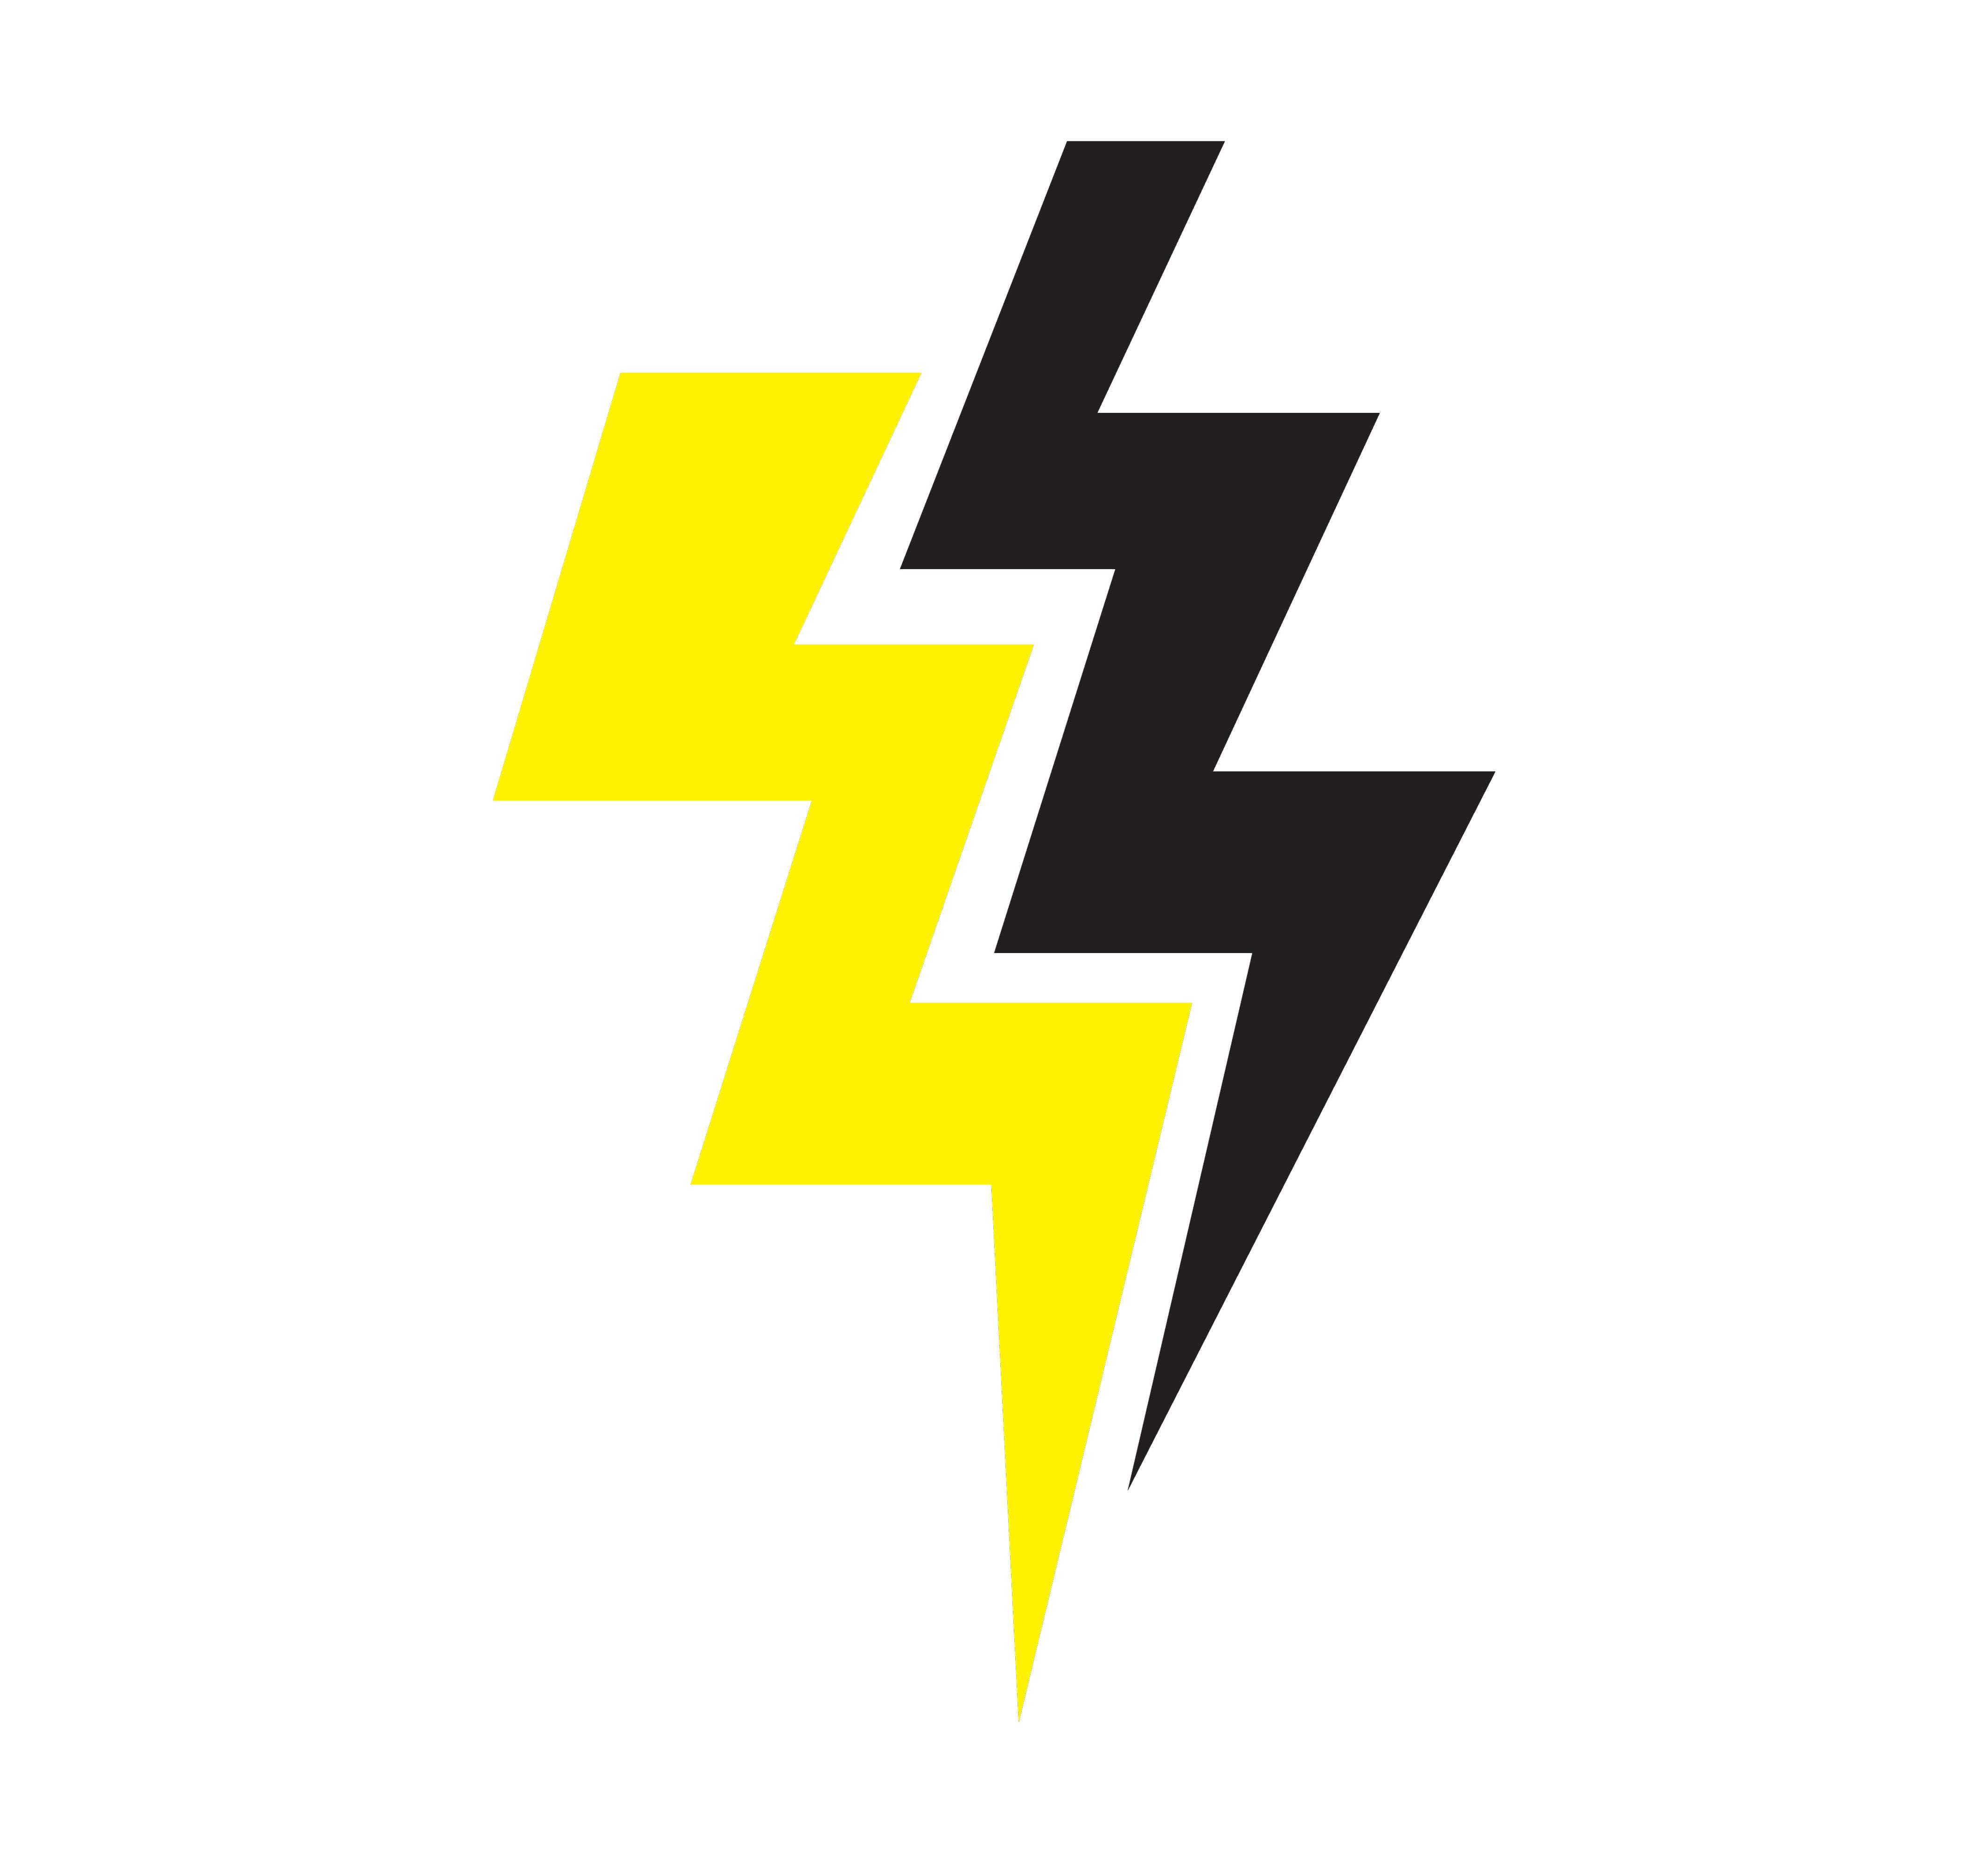 Yellow And Black Thunder Symbol